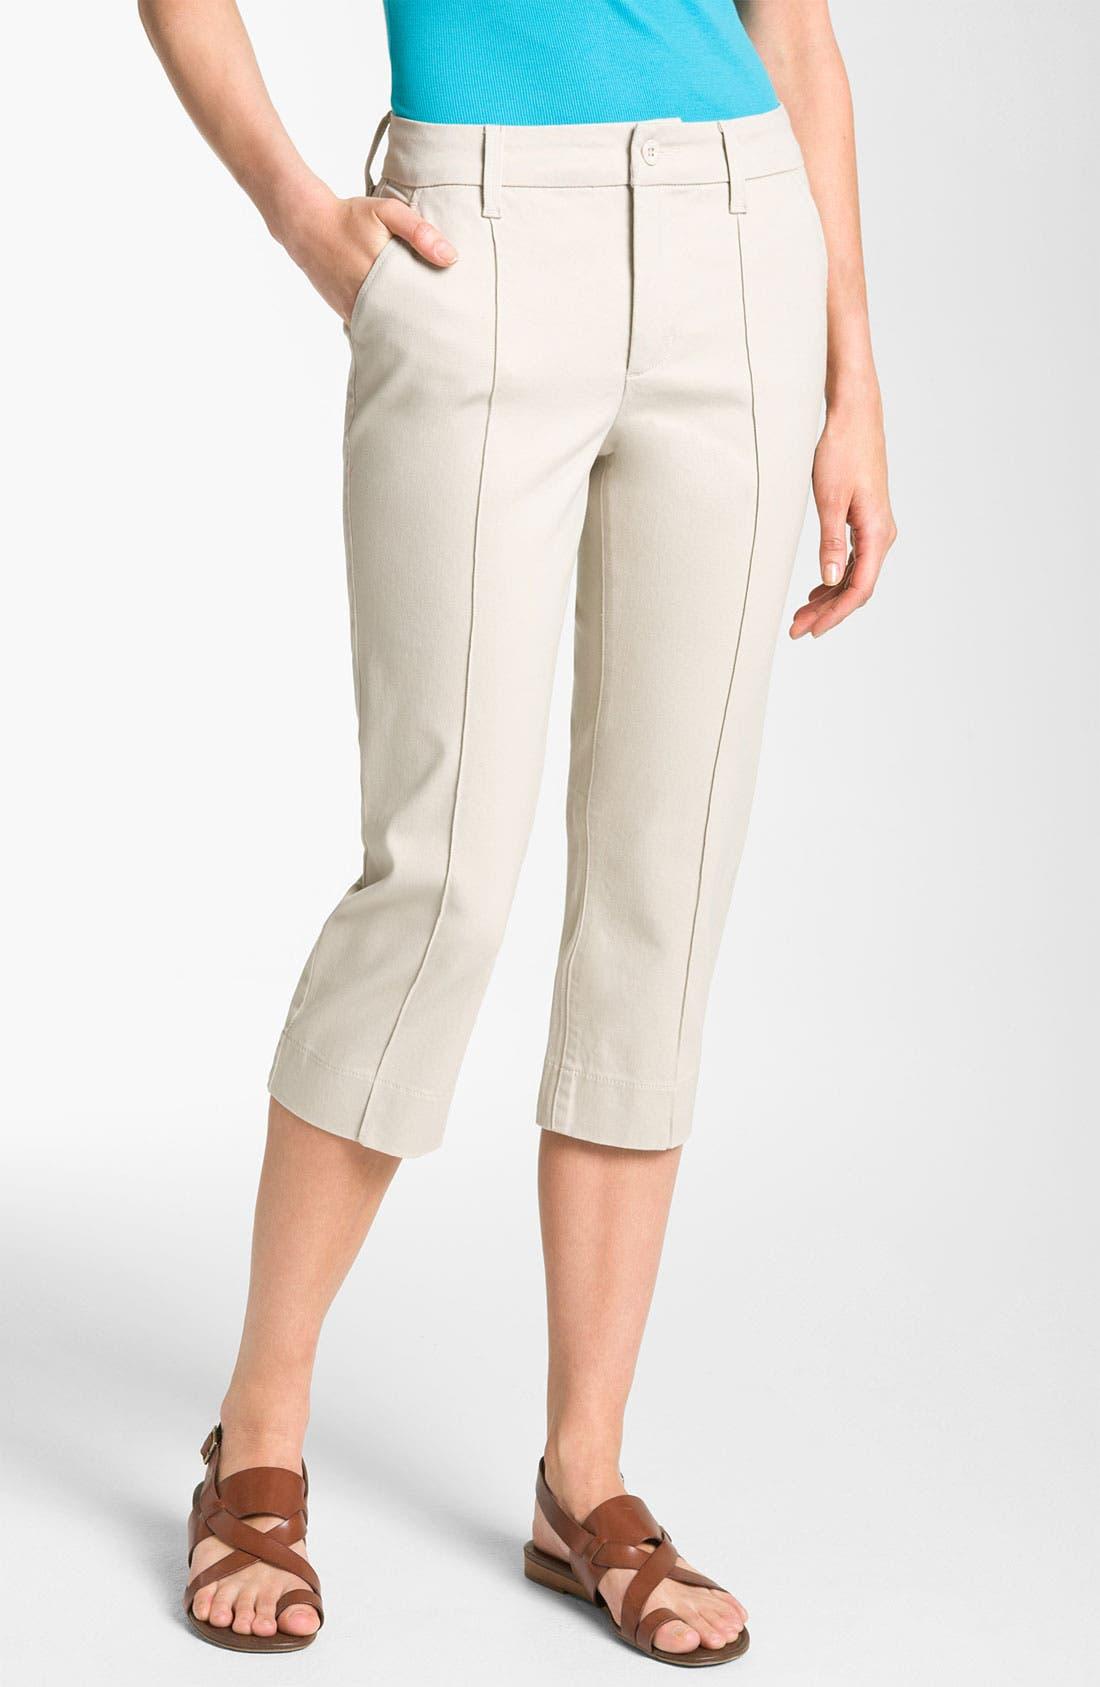 Alternate Image 1 Selected - NYDJ 'Anita' Pintuck Crop Pants